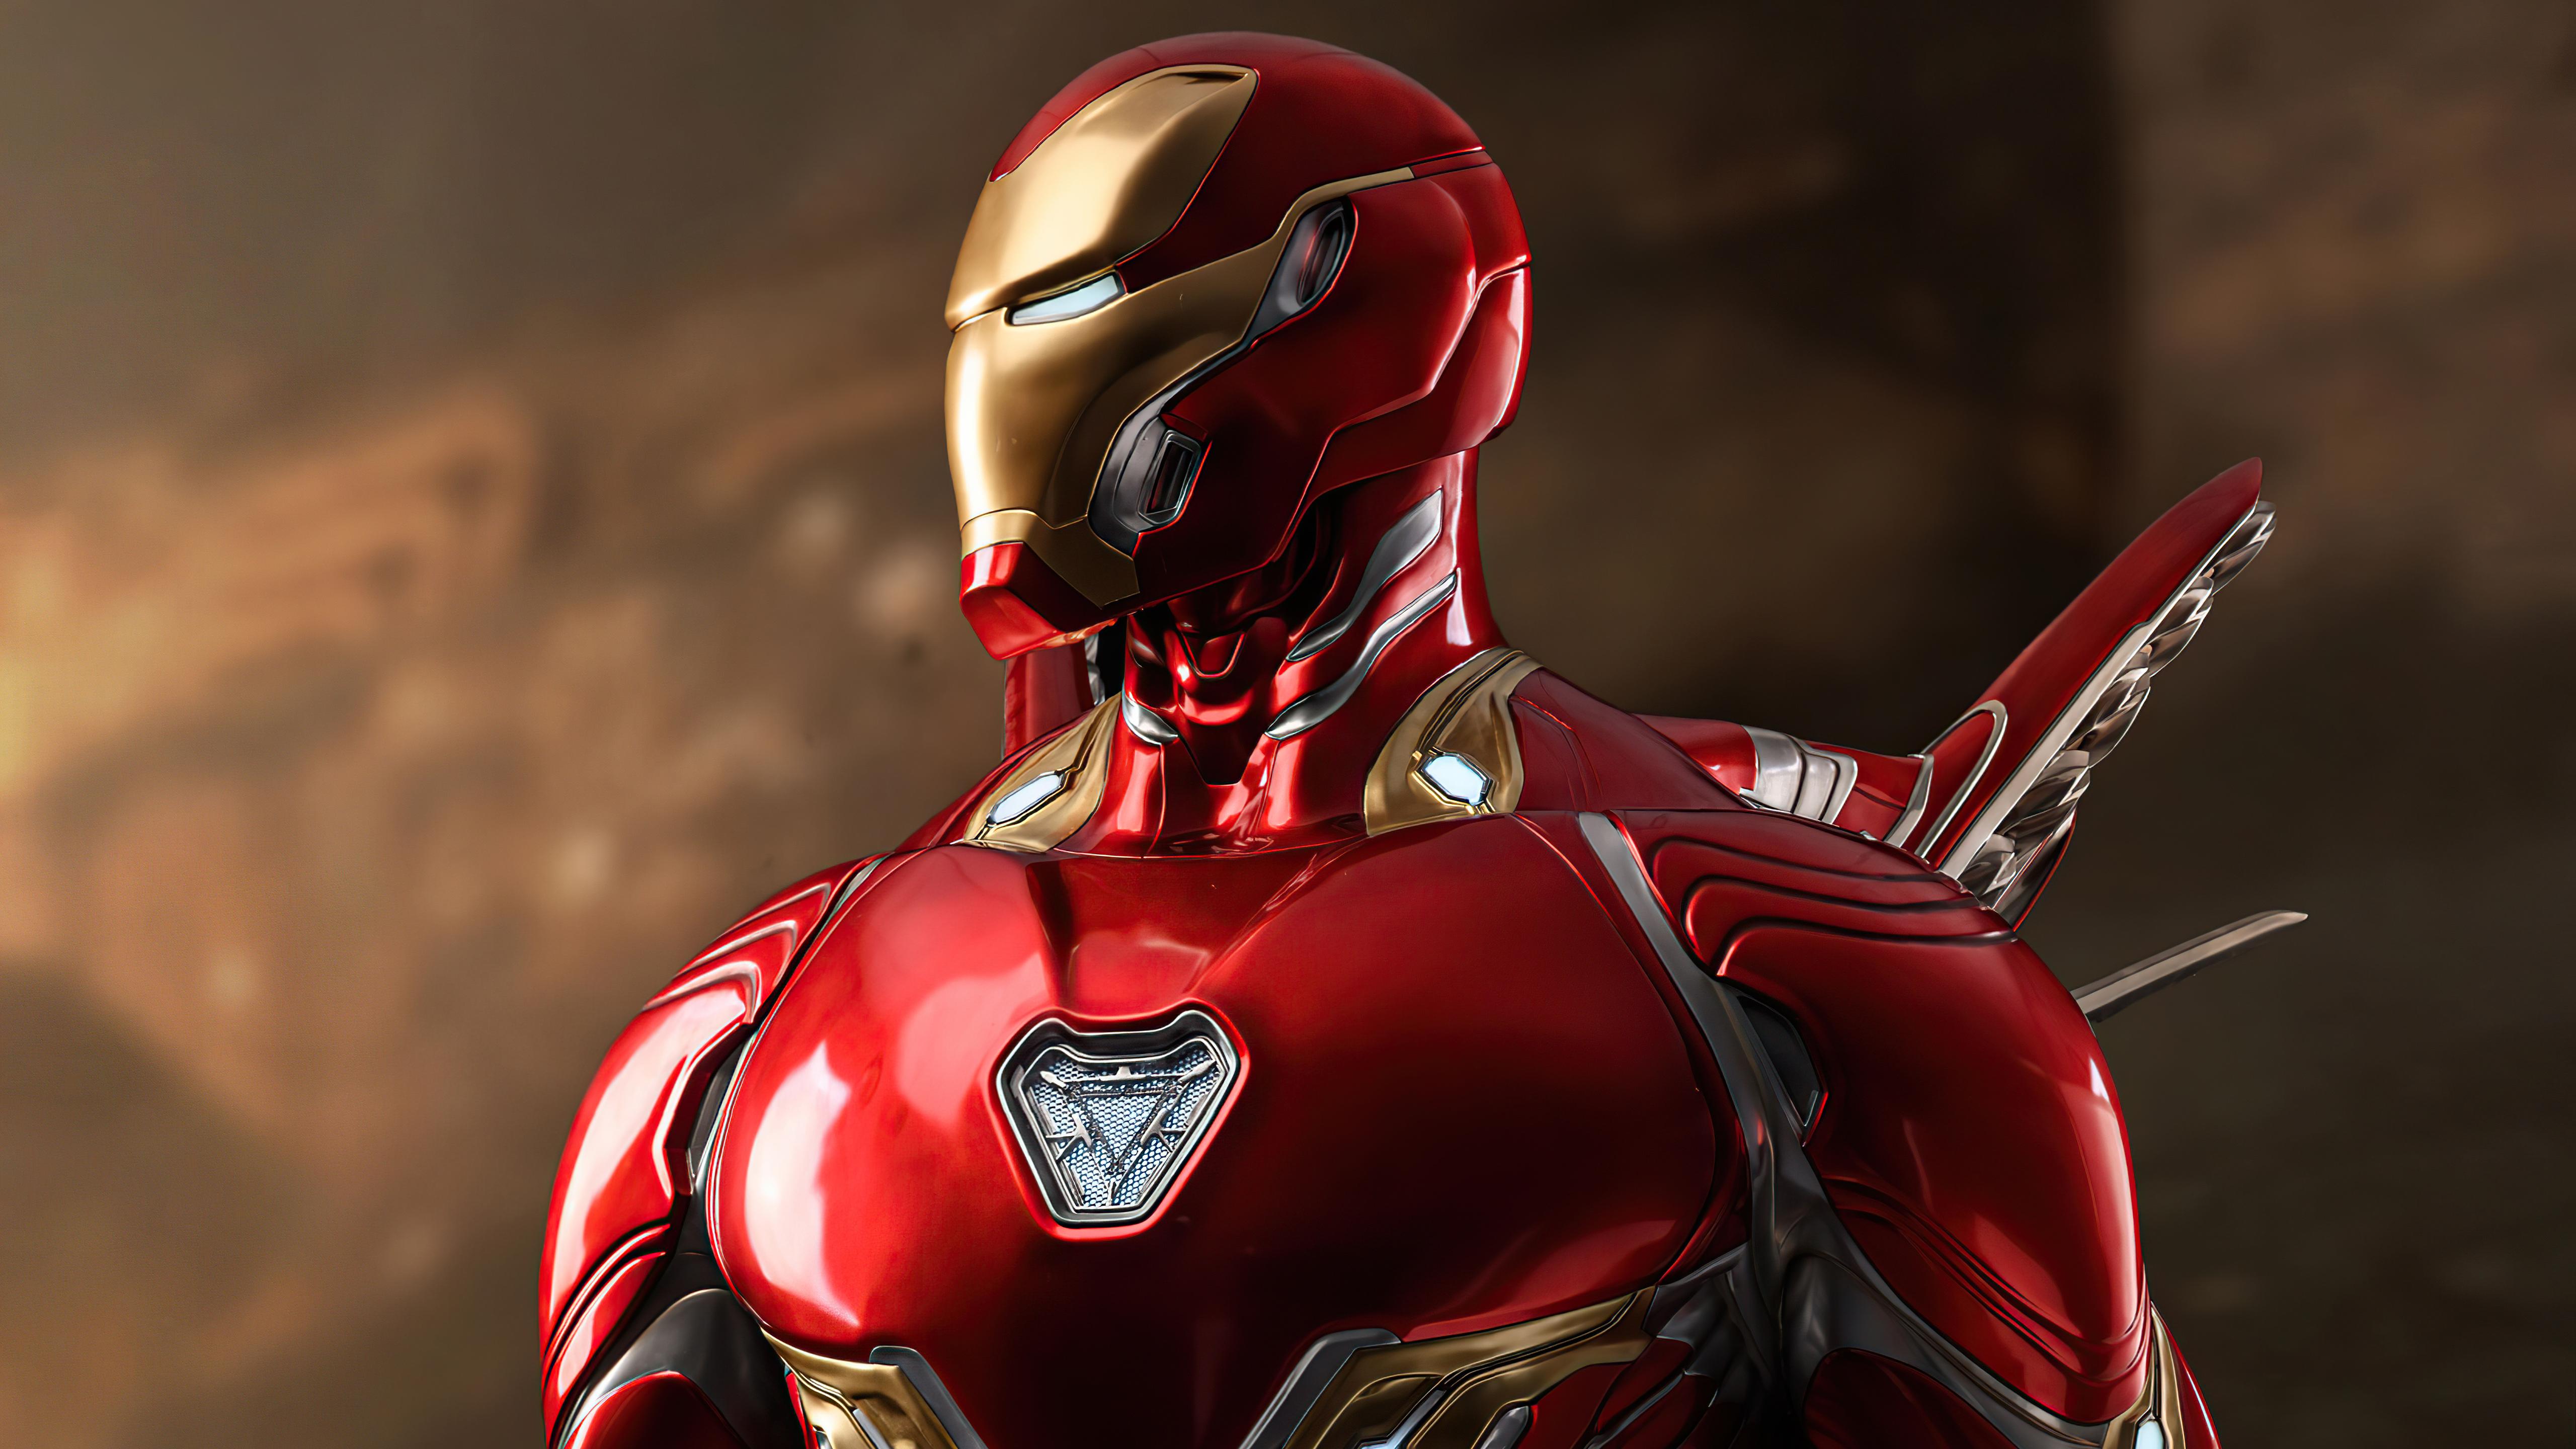 Fondos de pantalla Nuevo traje de Iron Man